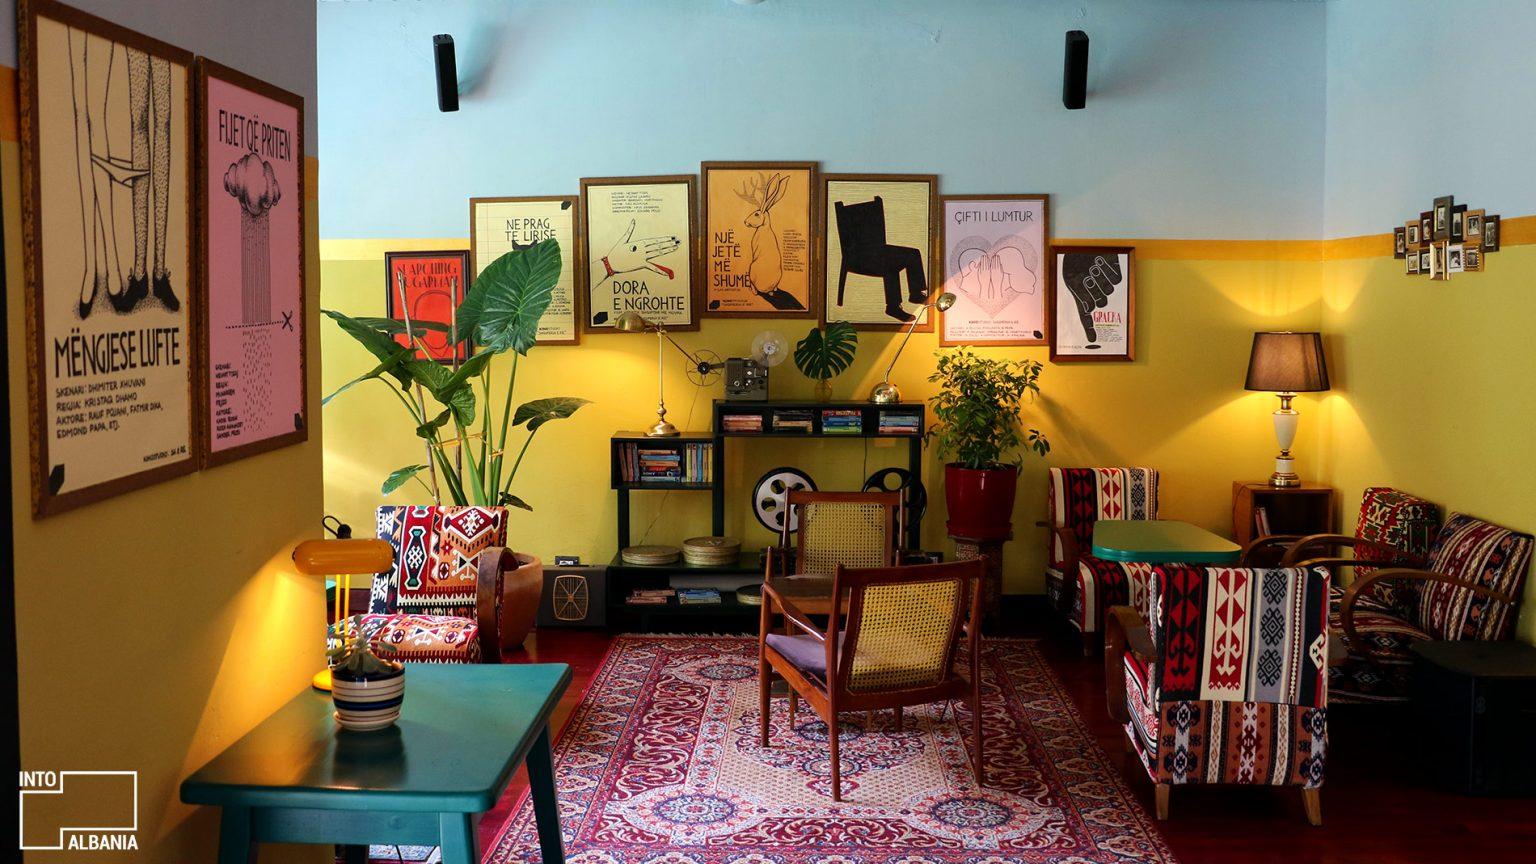 Kino bar style, photo by IntoAlbania.